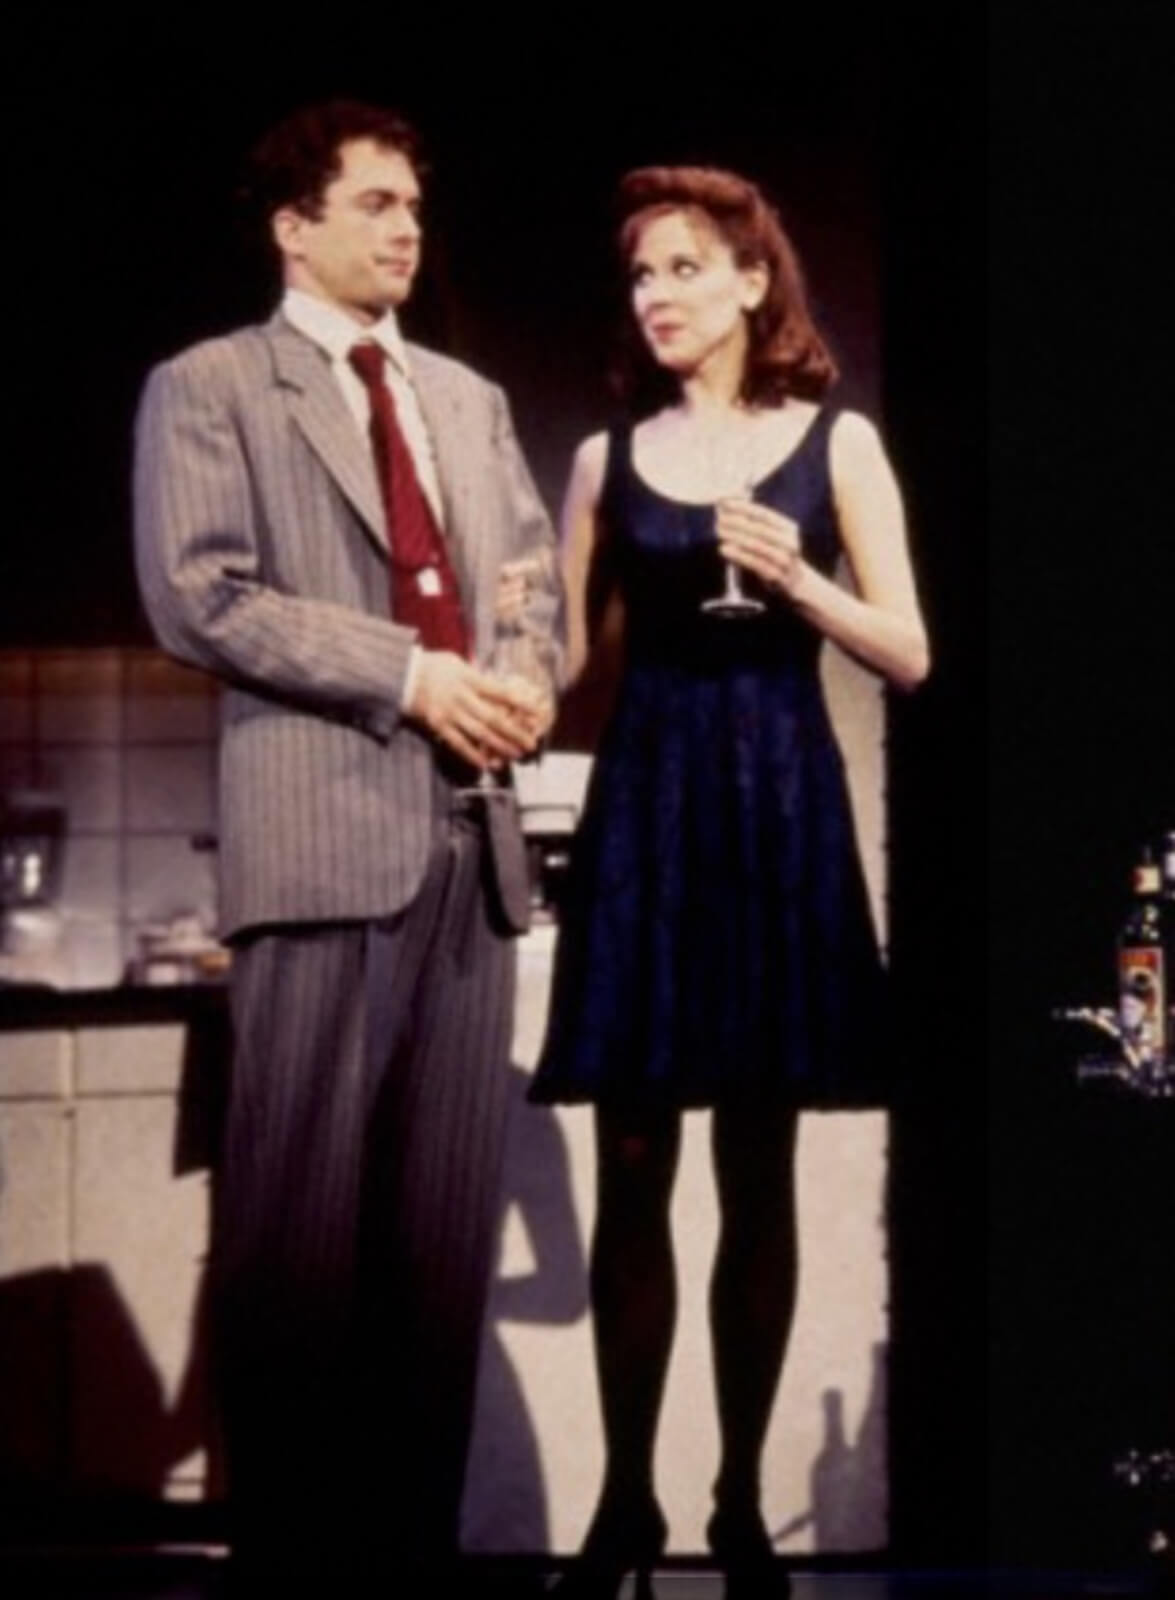 Josh (Daniel H. Jenkins) and Susan (Crista Moore) meet.